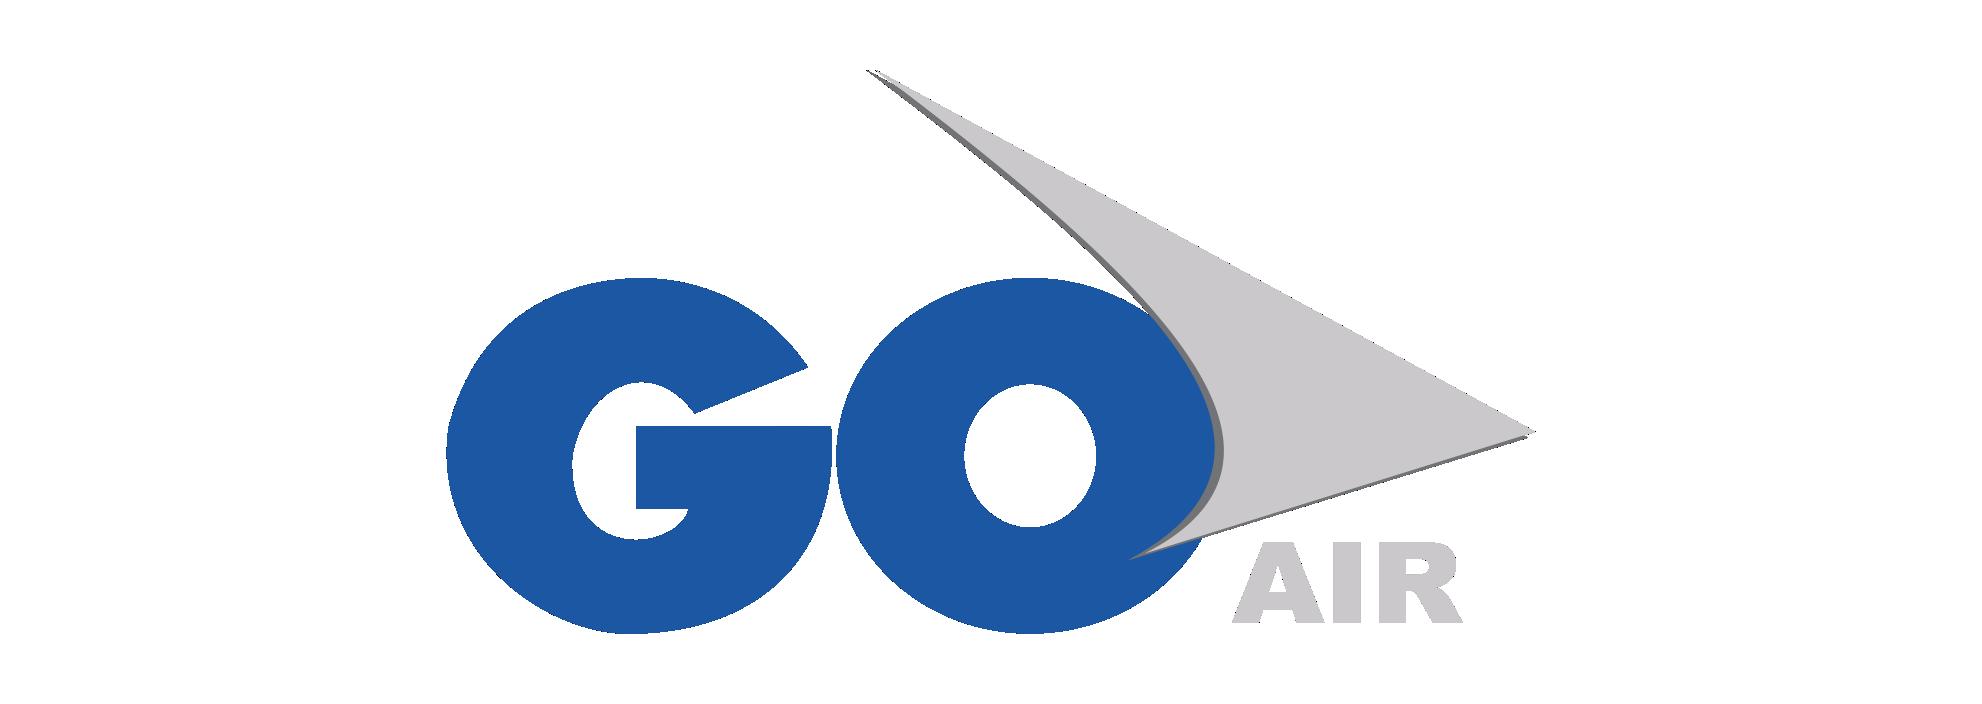 https://www.abraphe.org.br/wp-content/uploads/2019/04/logo_goair.png